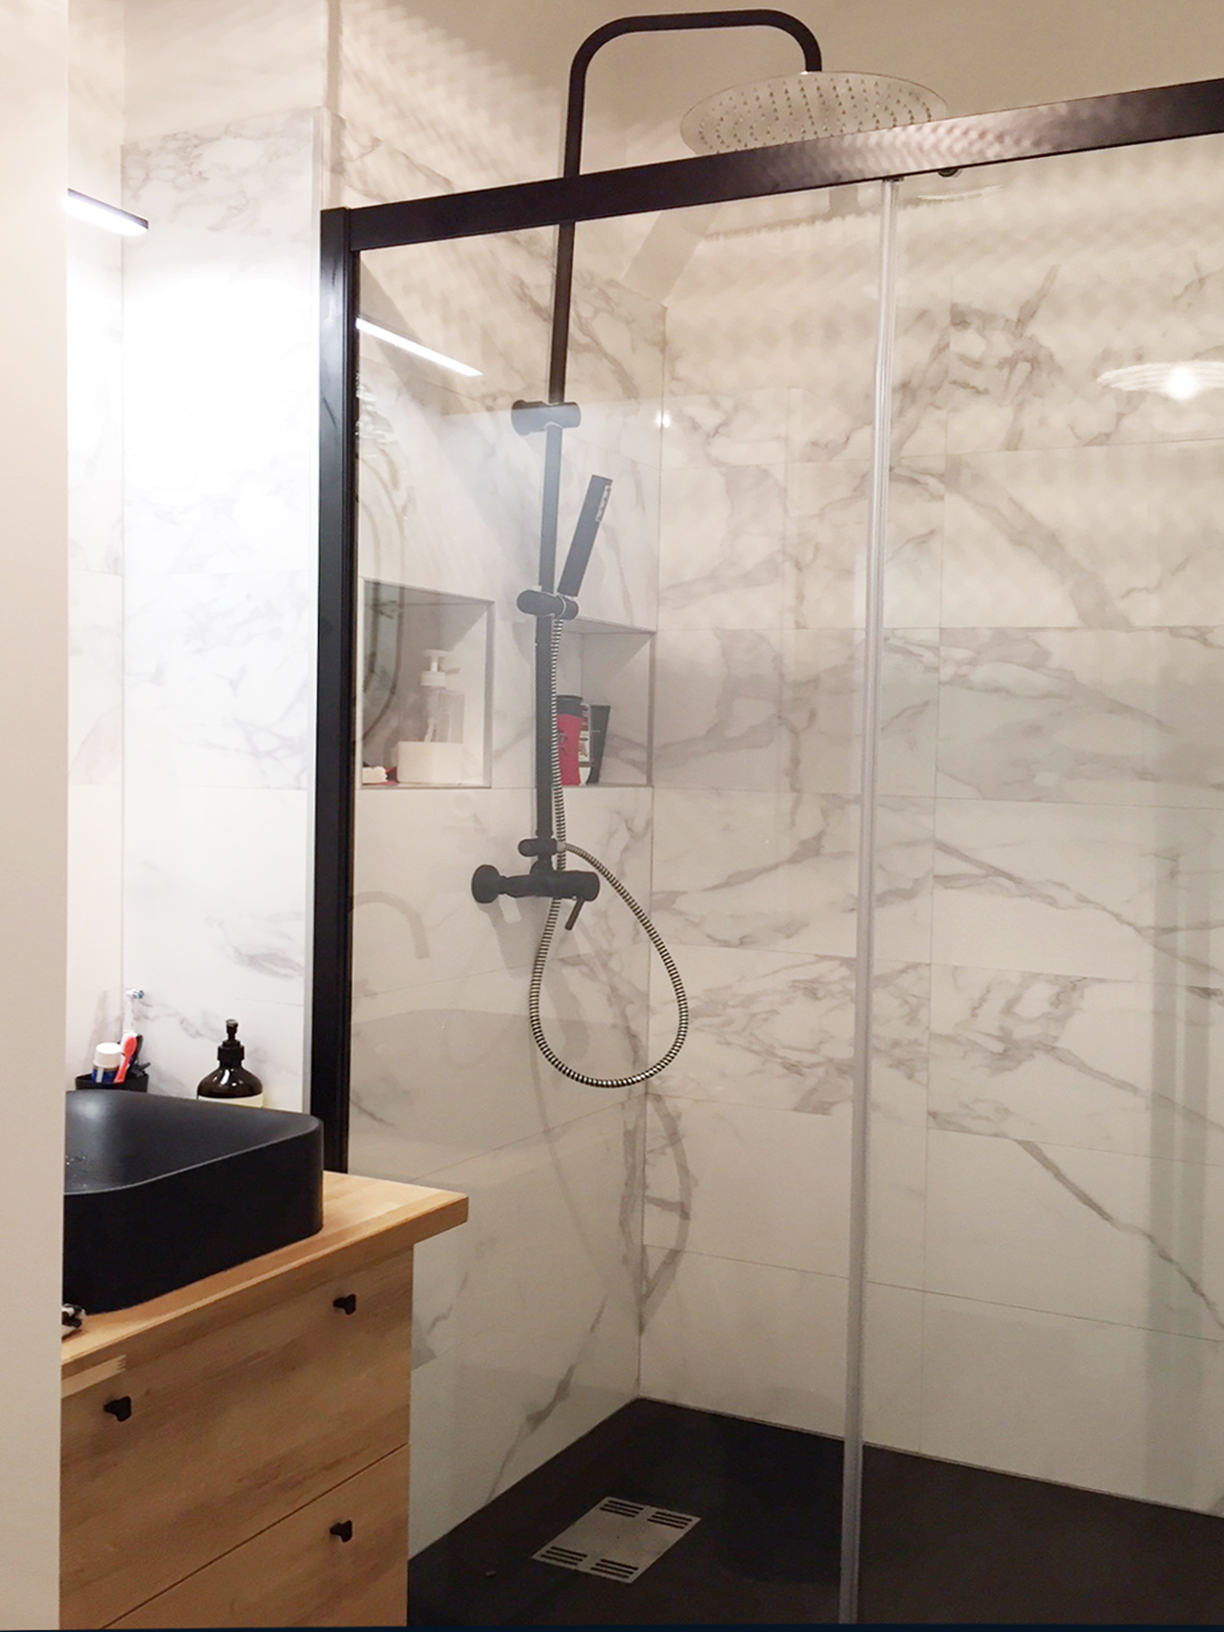 Creer Rangement Salle De Bain transformation d'une salle de bain — madame prune